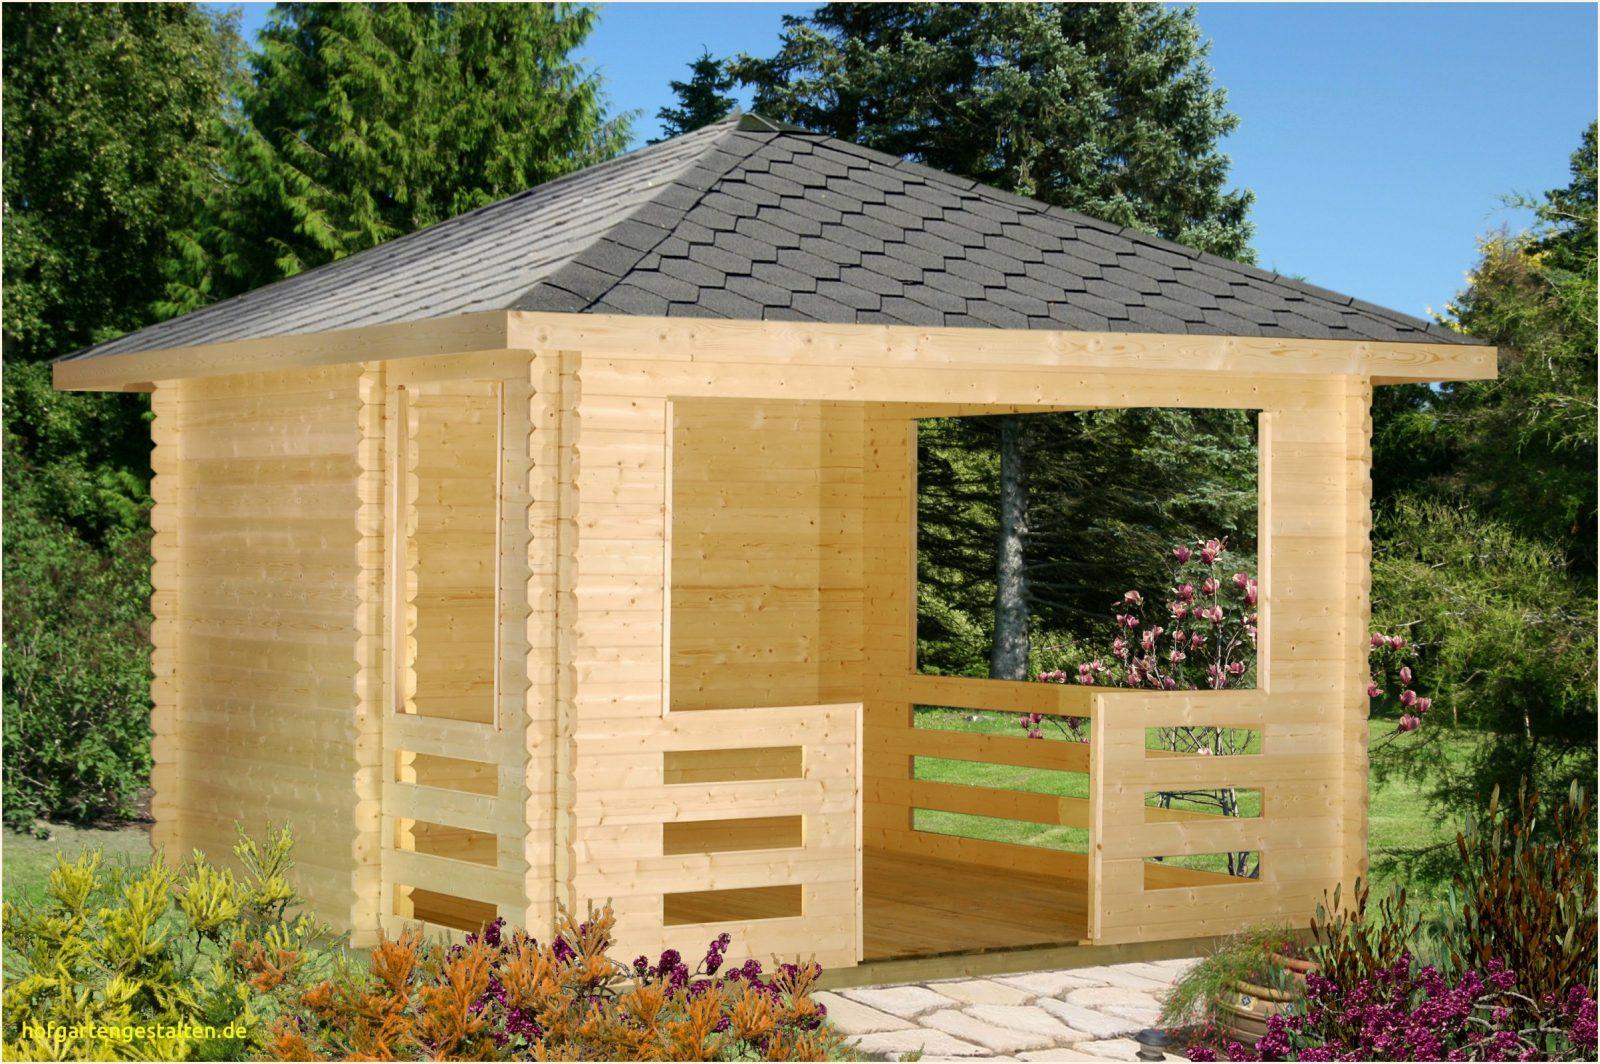 Holz Pavillon Garten Elegant Pavillons Kaufen Pavillon Aus Holz Für von Holz Pavillon Bausatz Günstig Photo